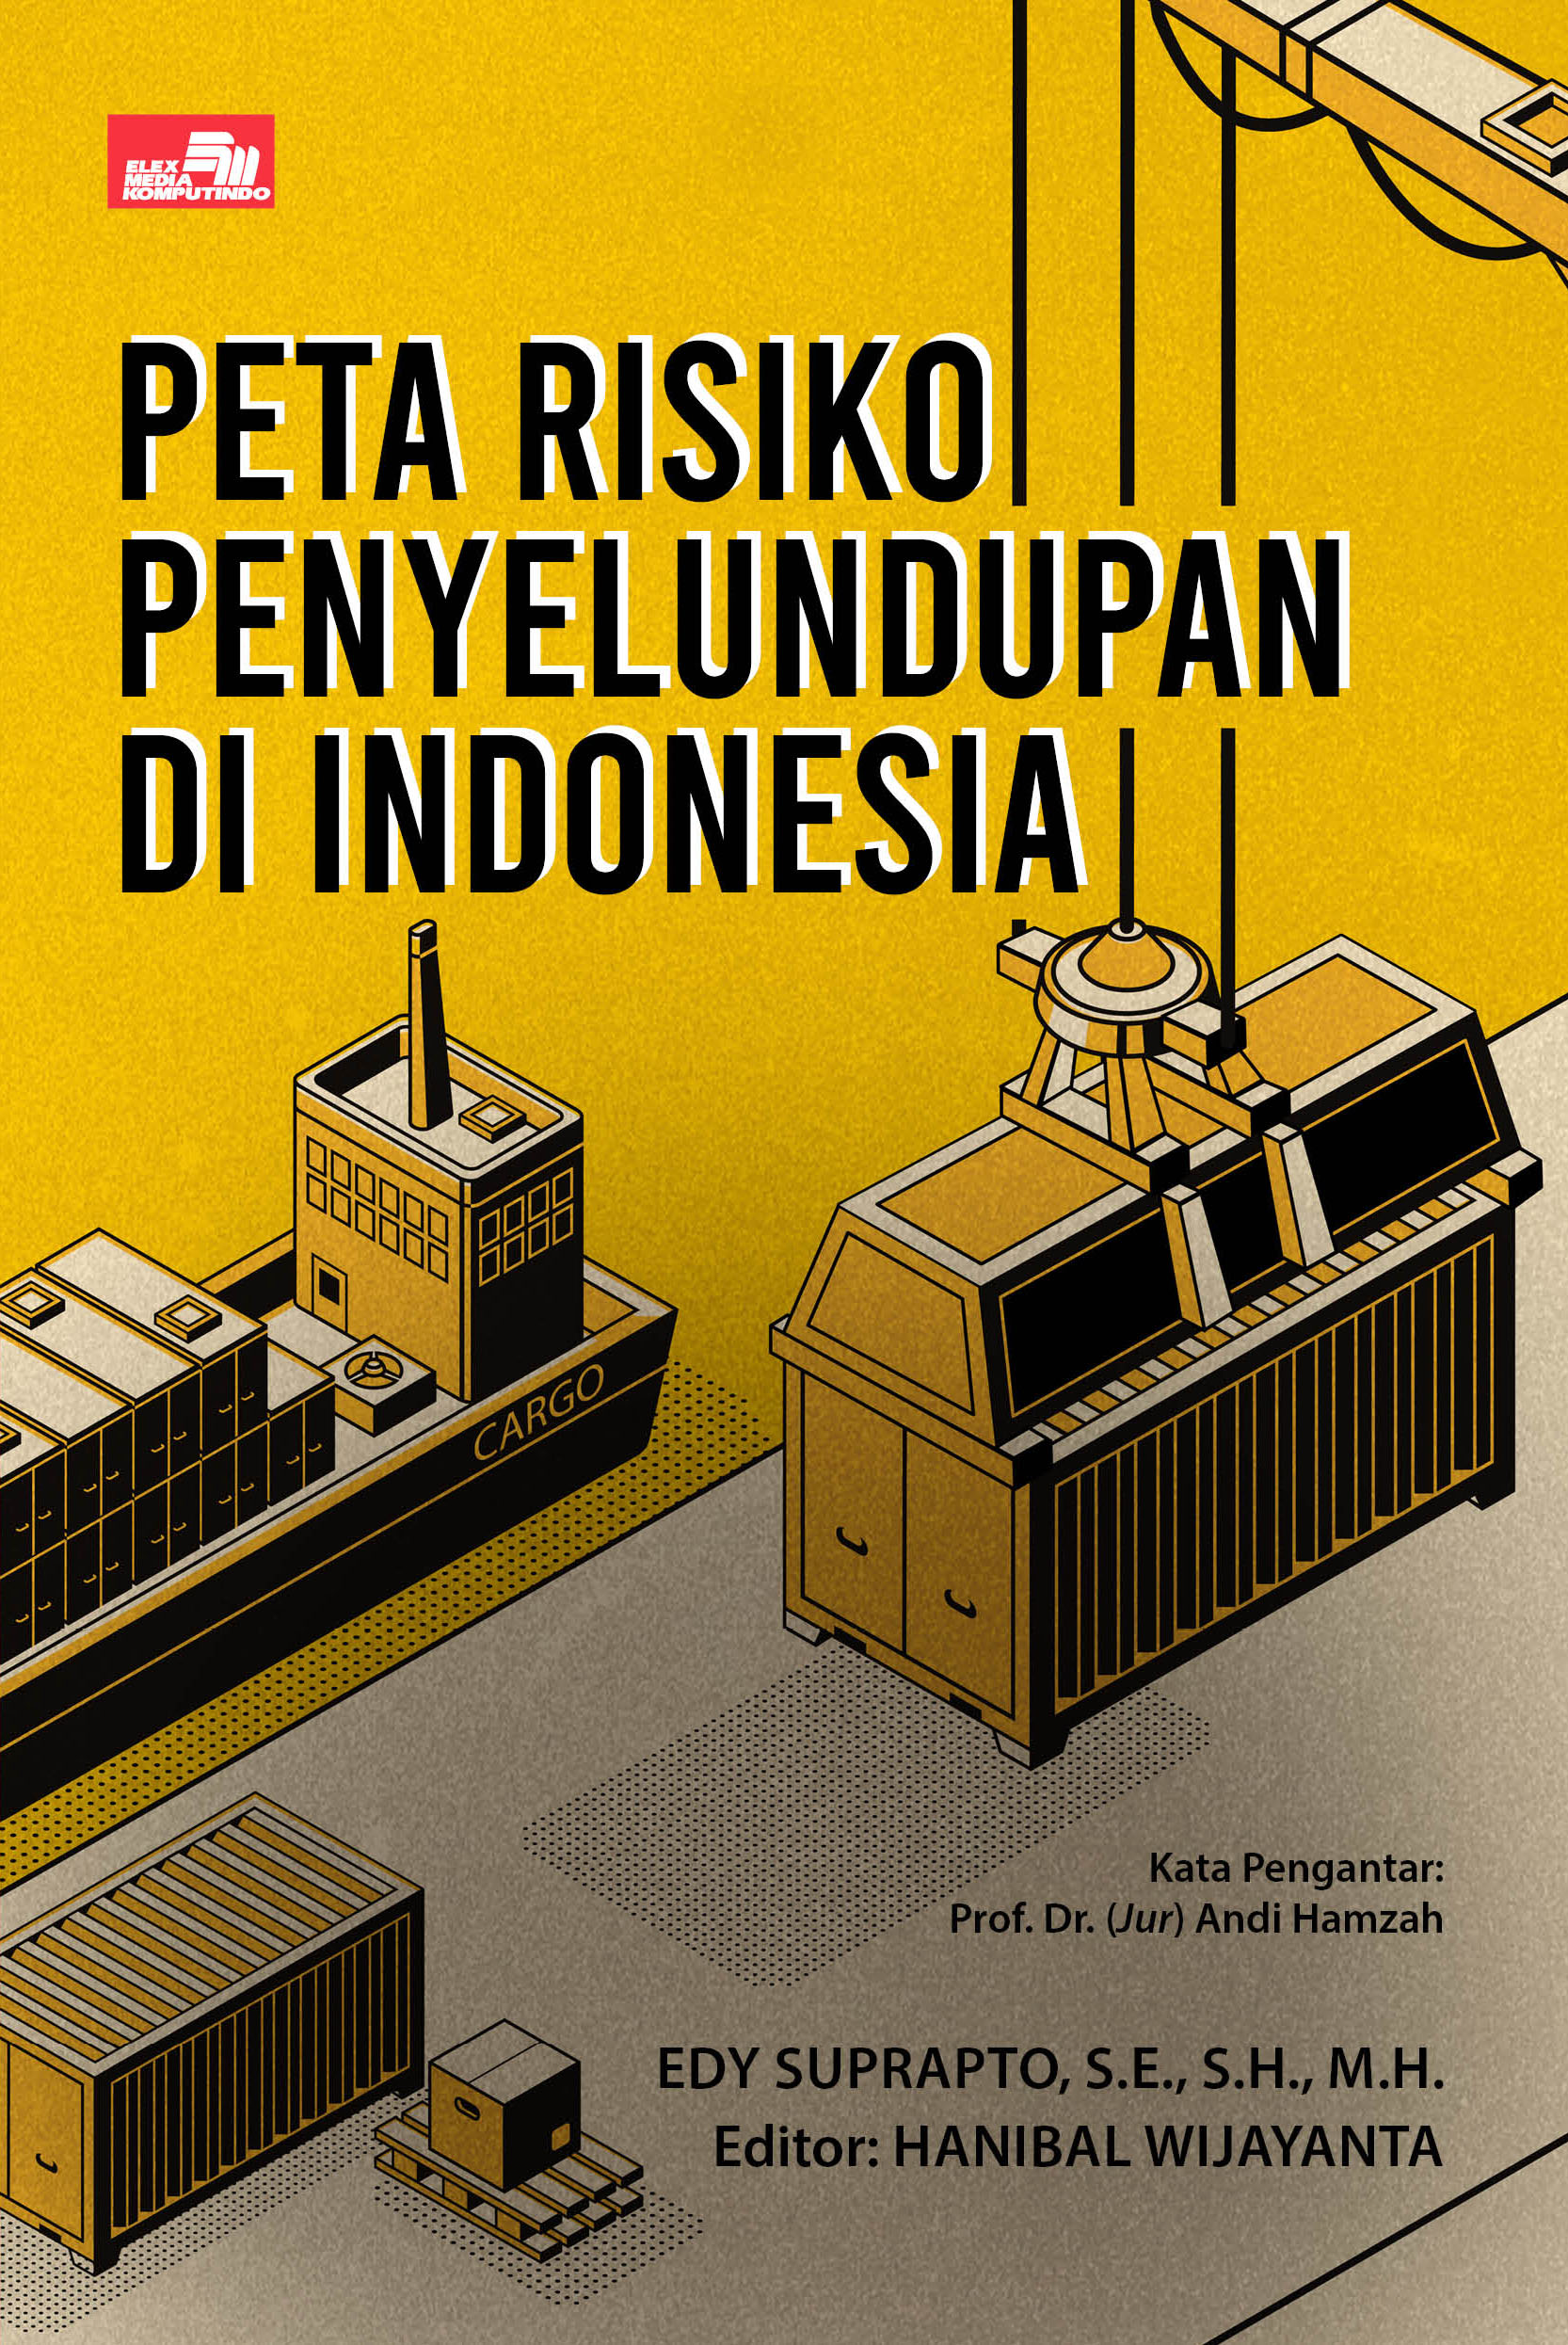 Peta Risiko Penyelundupan di Indonesia